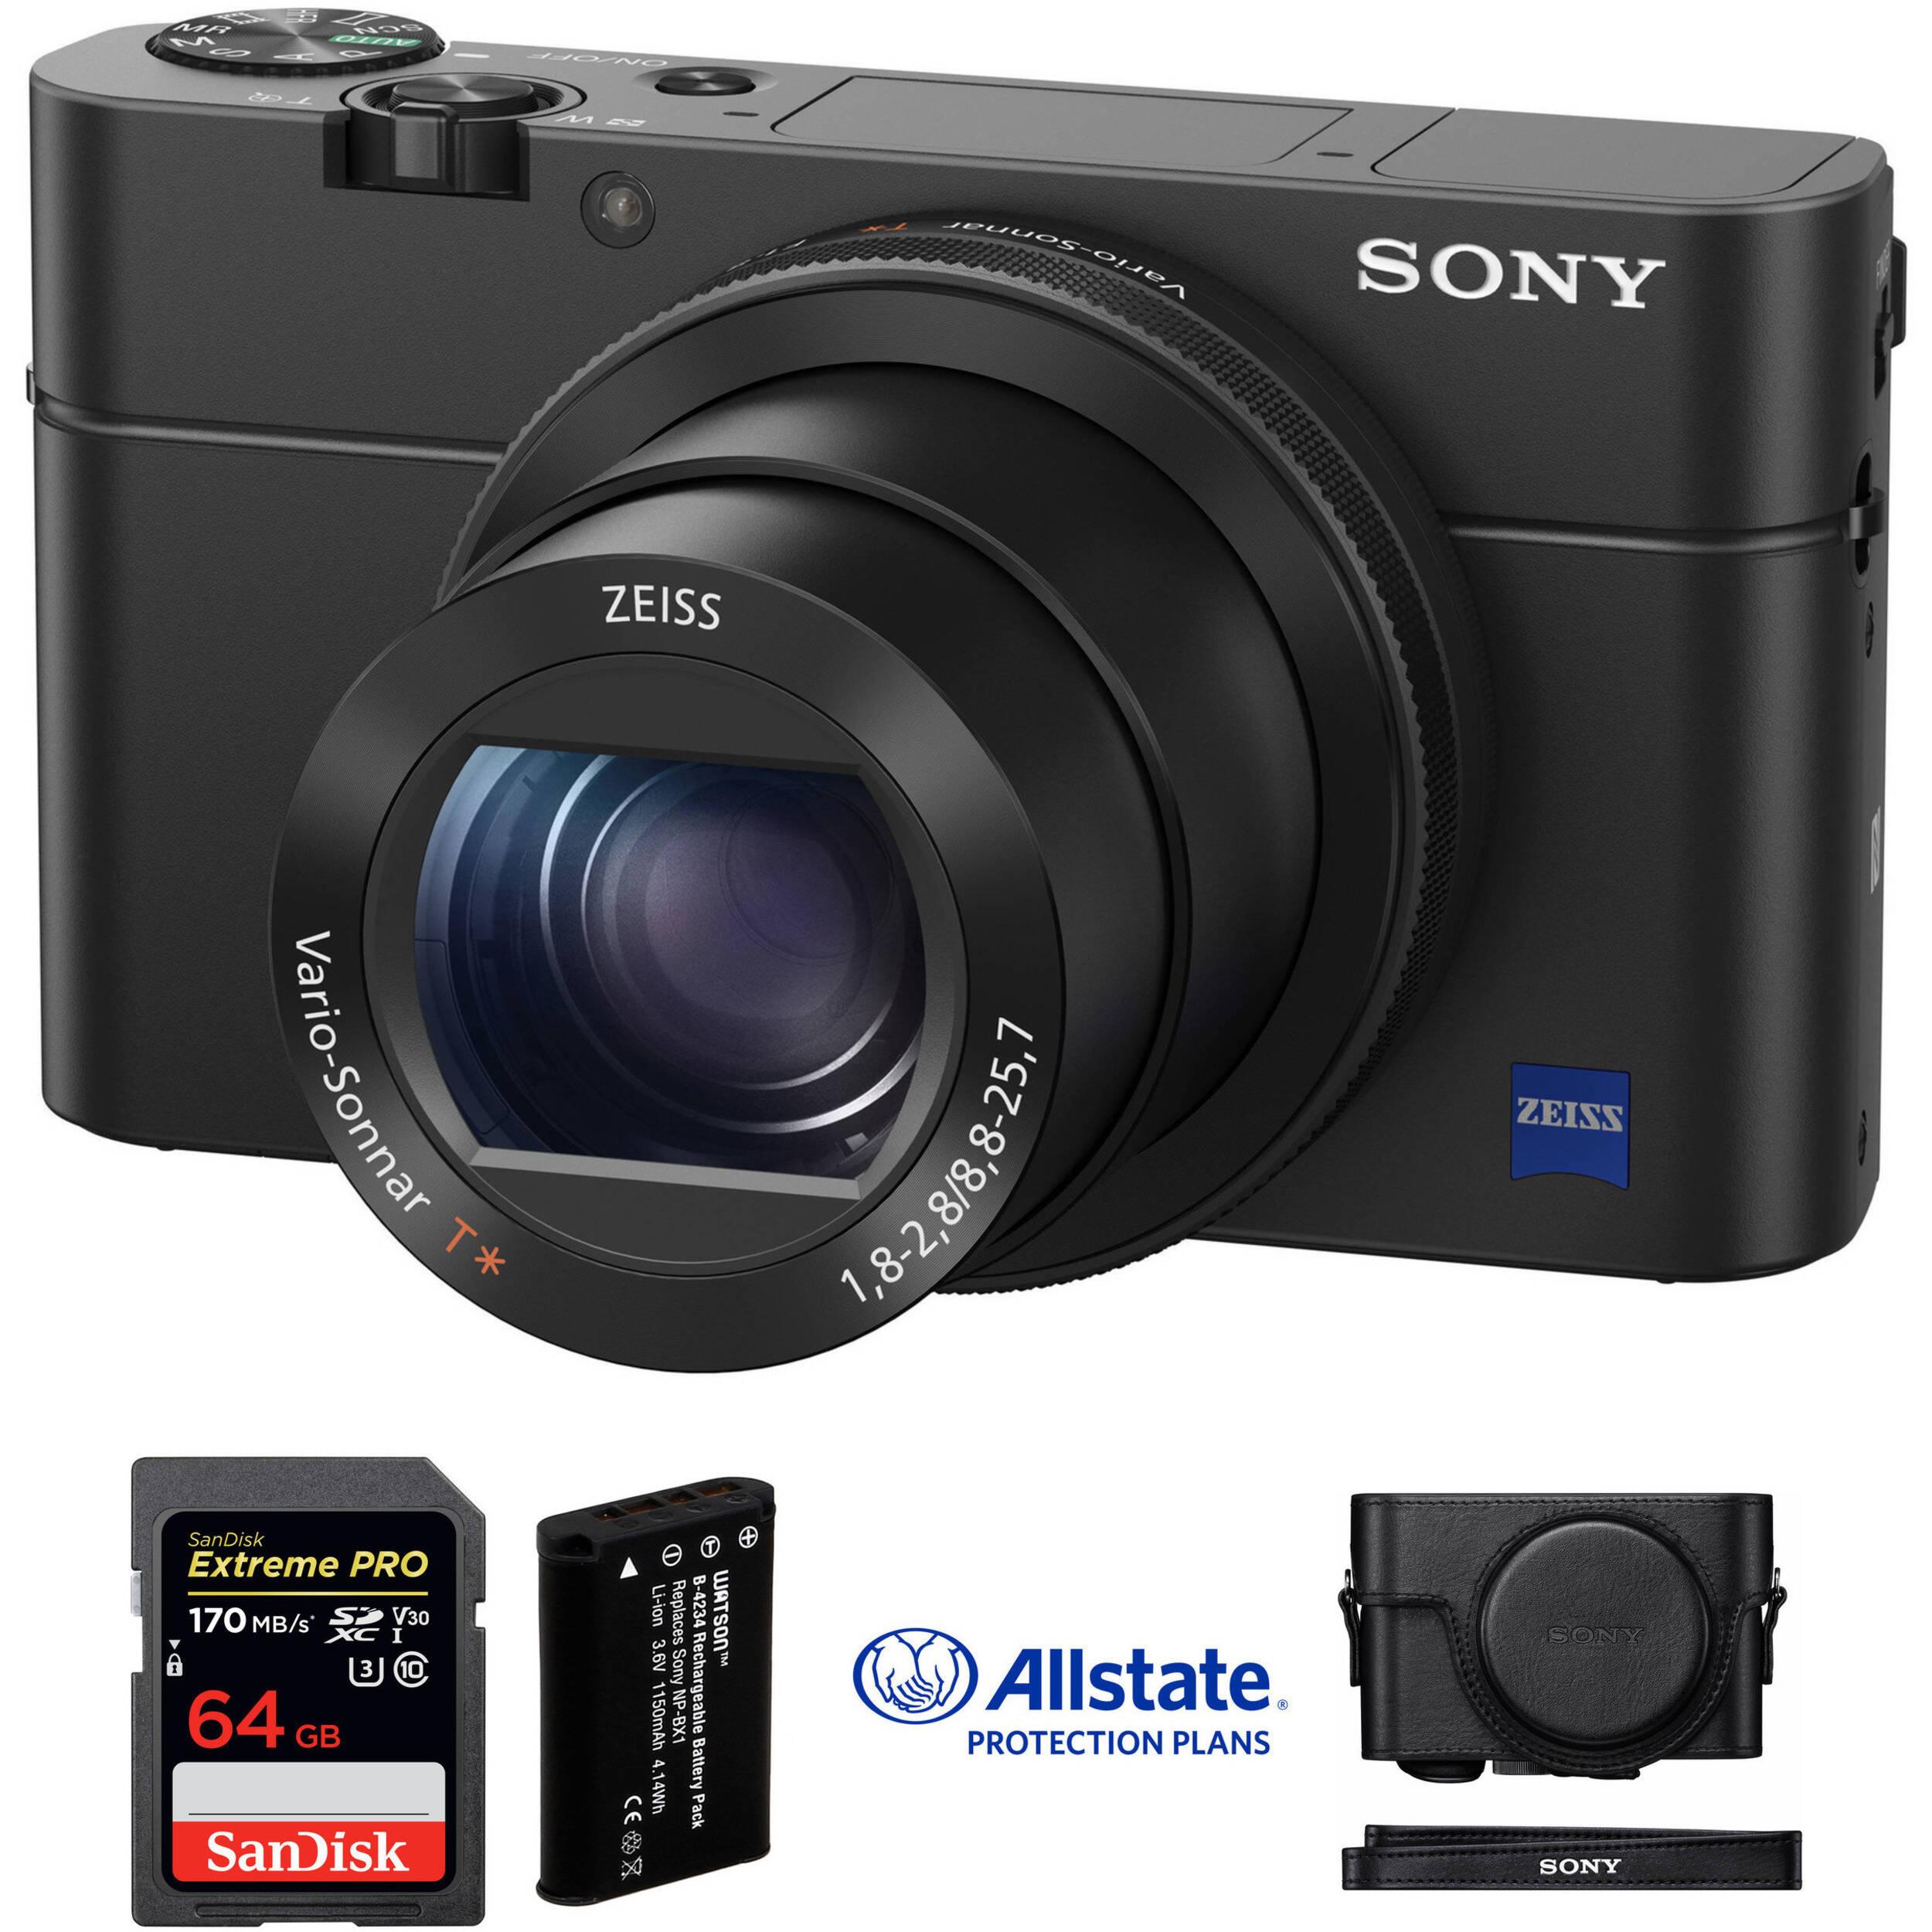 sony cyber shot dsc rx100 iv digital camera deluxe kit b h photo rh bhphotovideo com Sony Cyber-shot Manuals Owner Sony Cyber-shot DSC H70 Manual